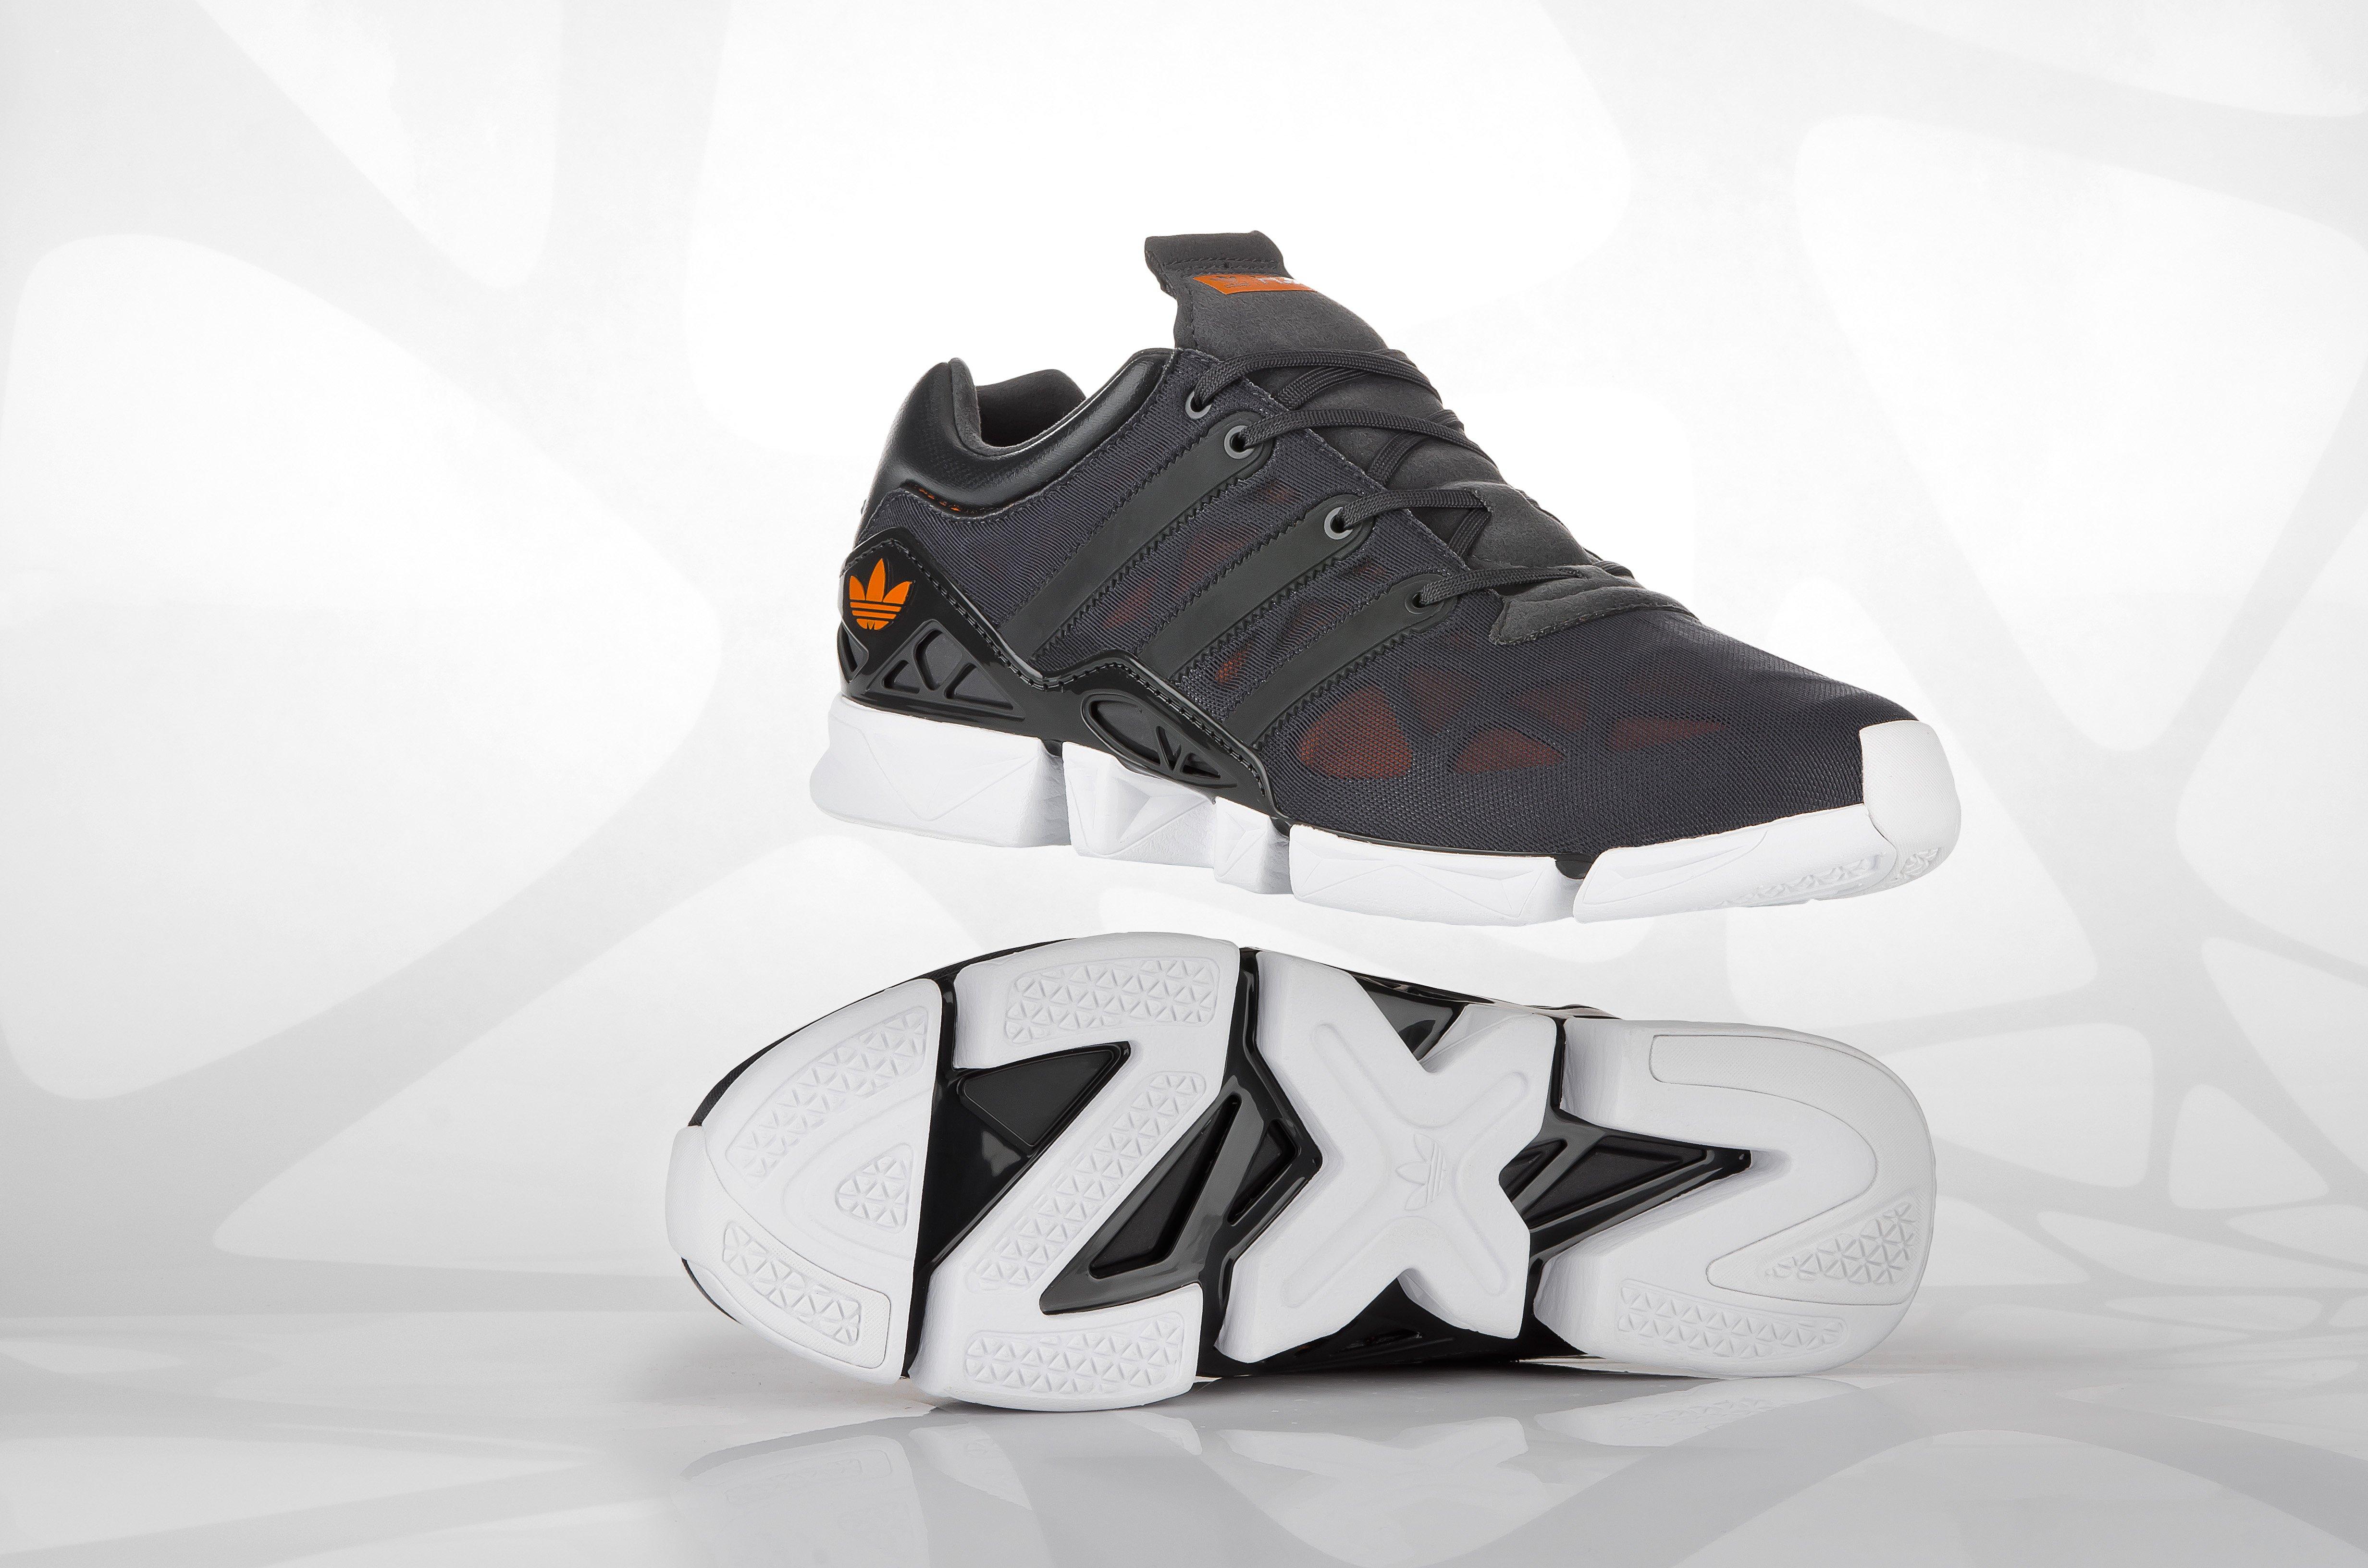 Men Adidas H3lium ZXZ Running Shoes Black Pink Y3k2f : Up To